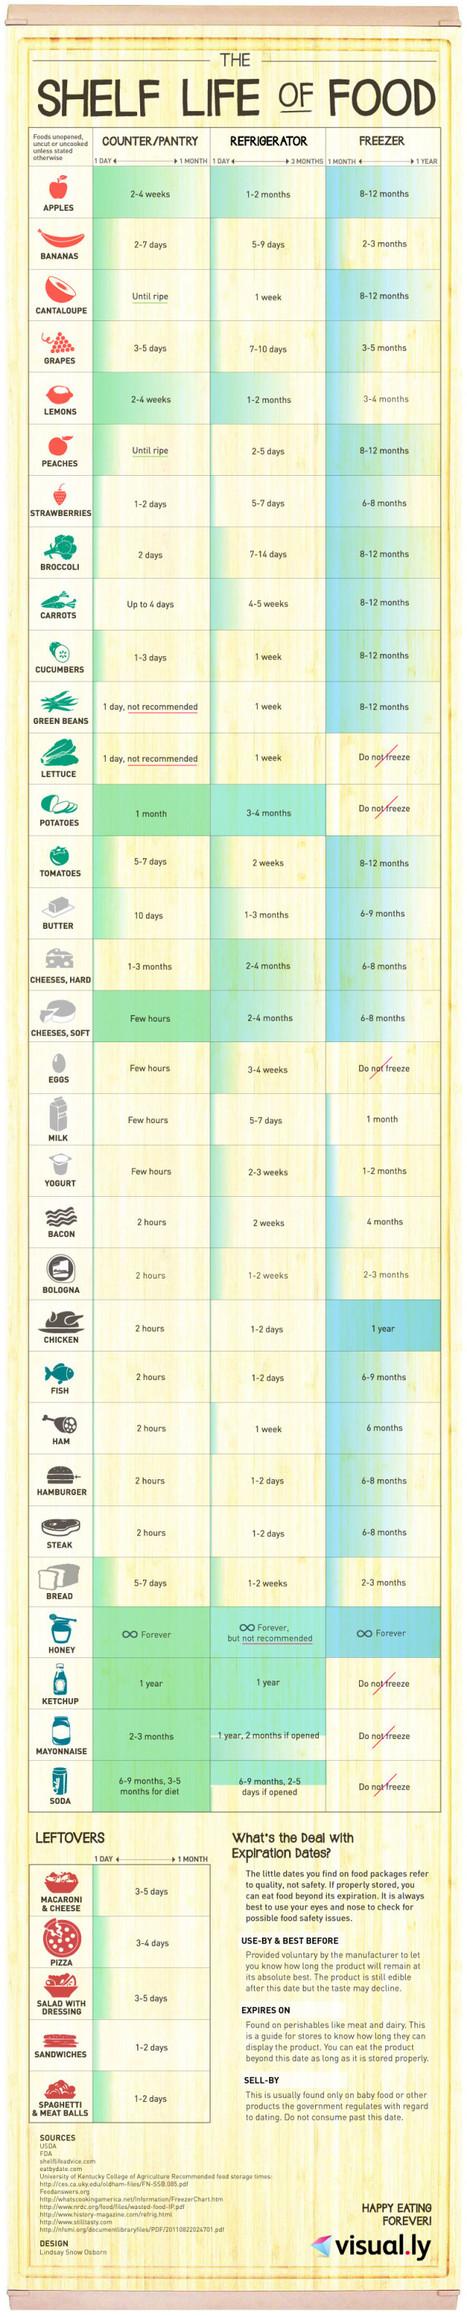 How Long Do Foods Last [Infographic] | BestInfographics.co | The Best Infographics | Scoop.it